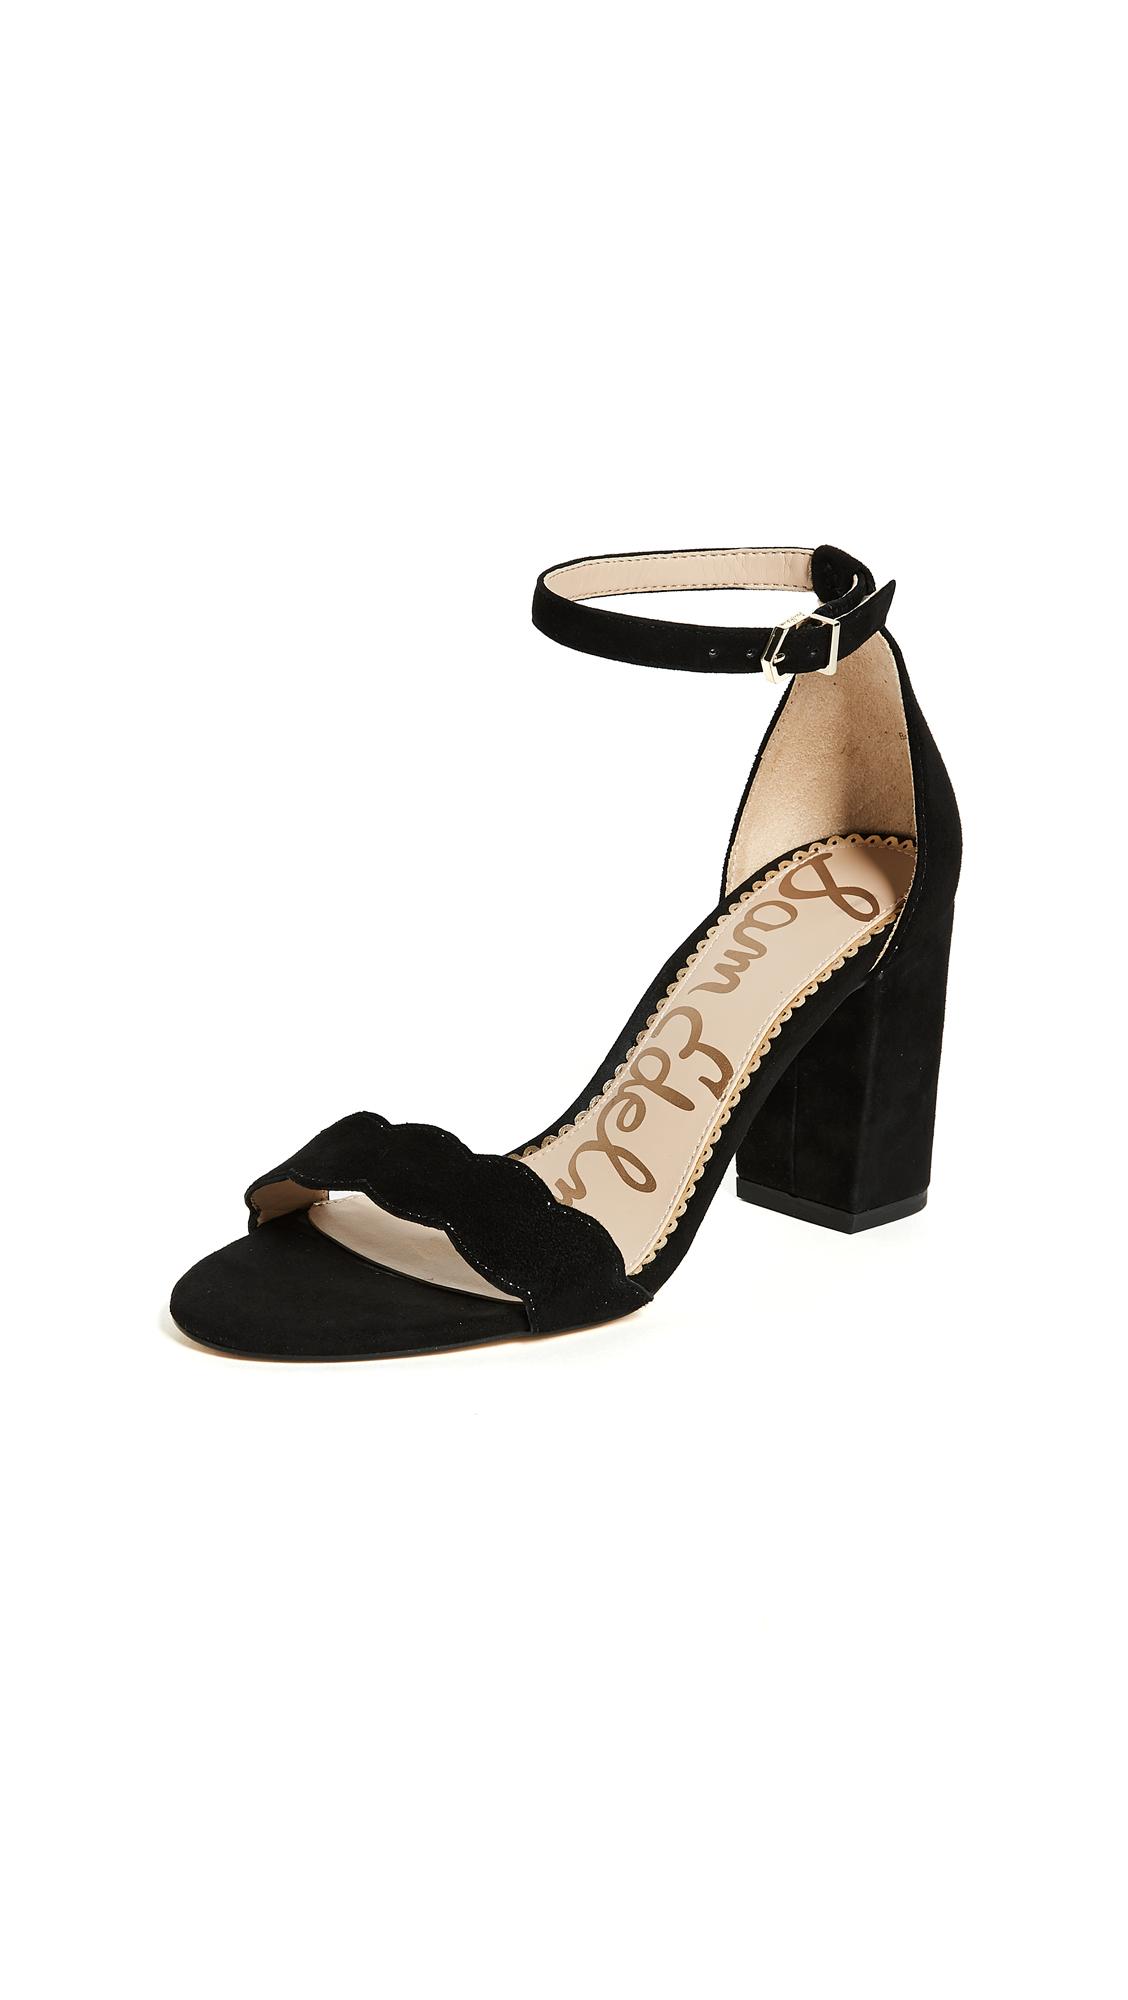 Buy Sam Edelman Odila Sandals online, shop Sam Edelman